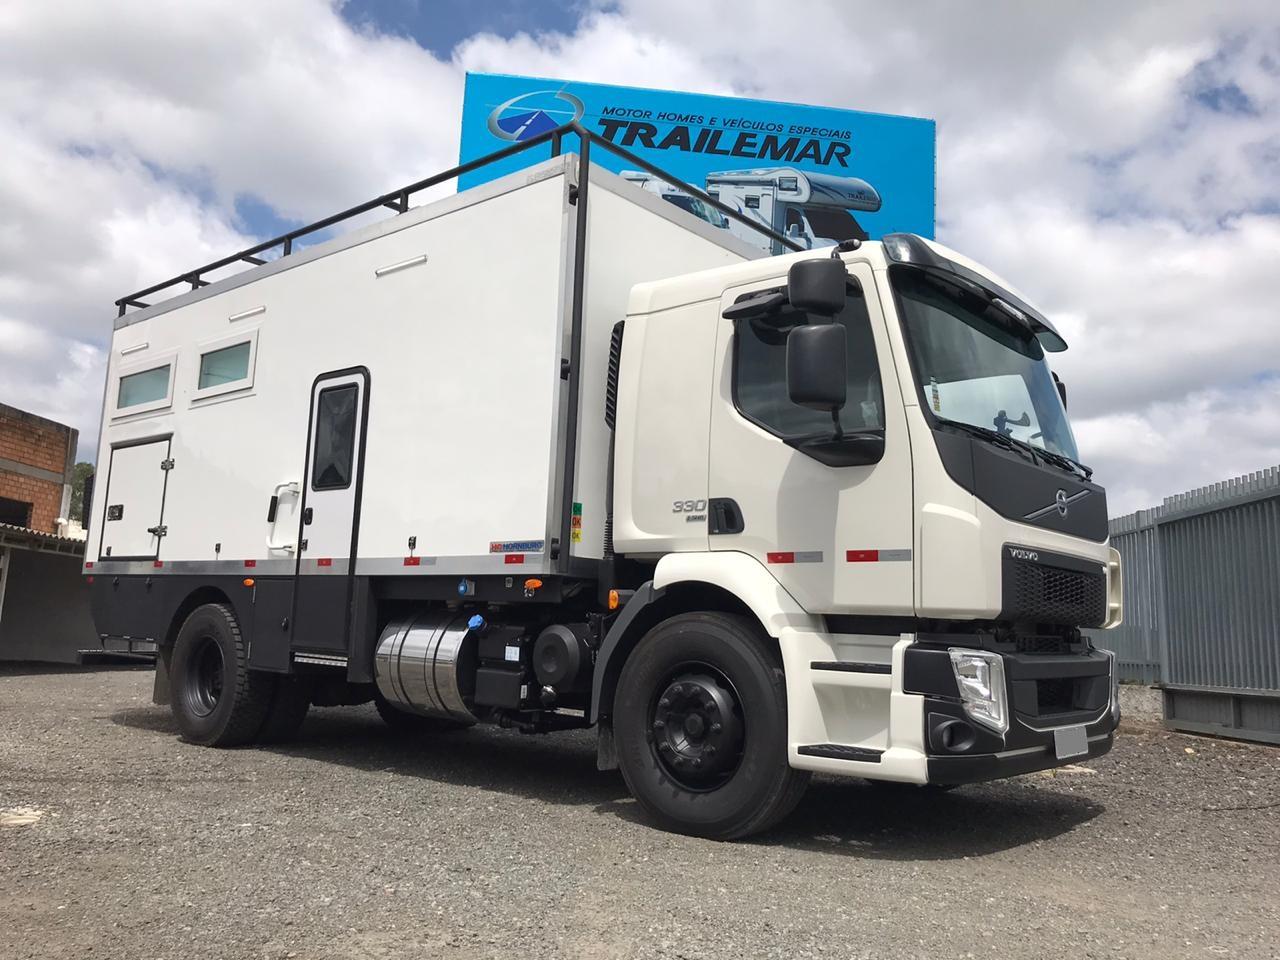 Trailemar Home Truck